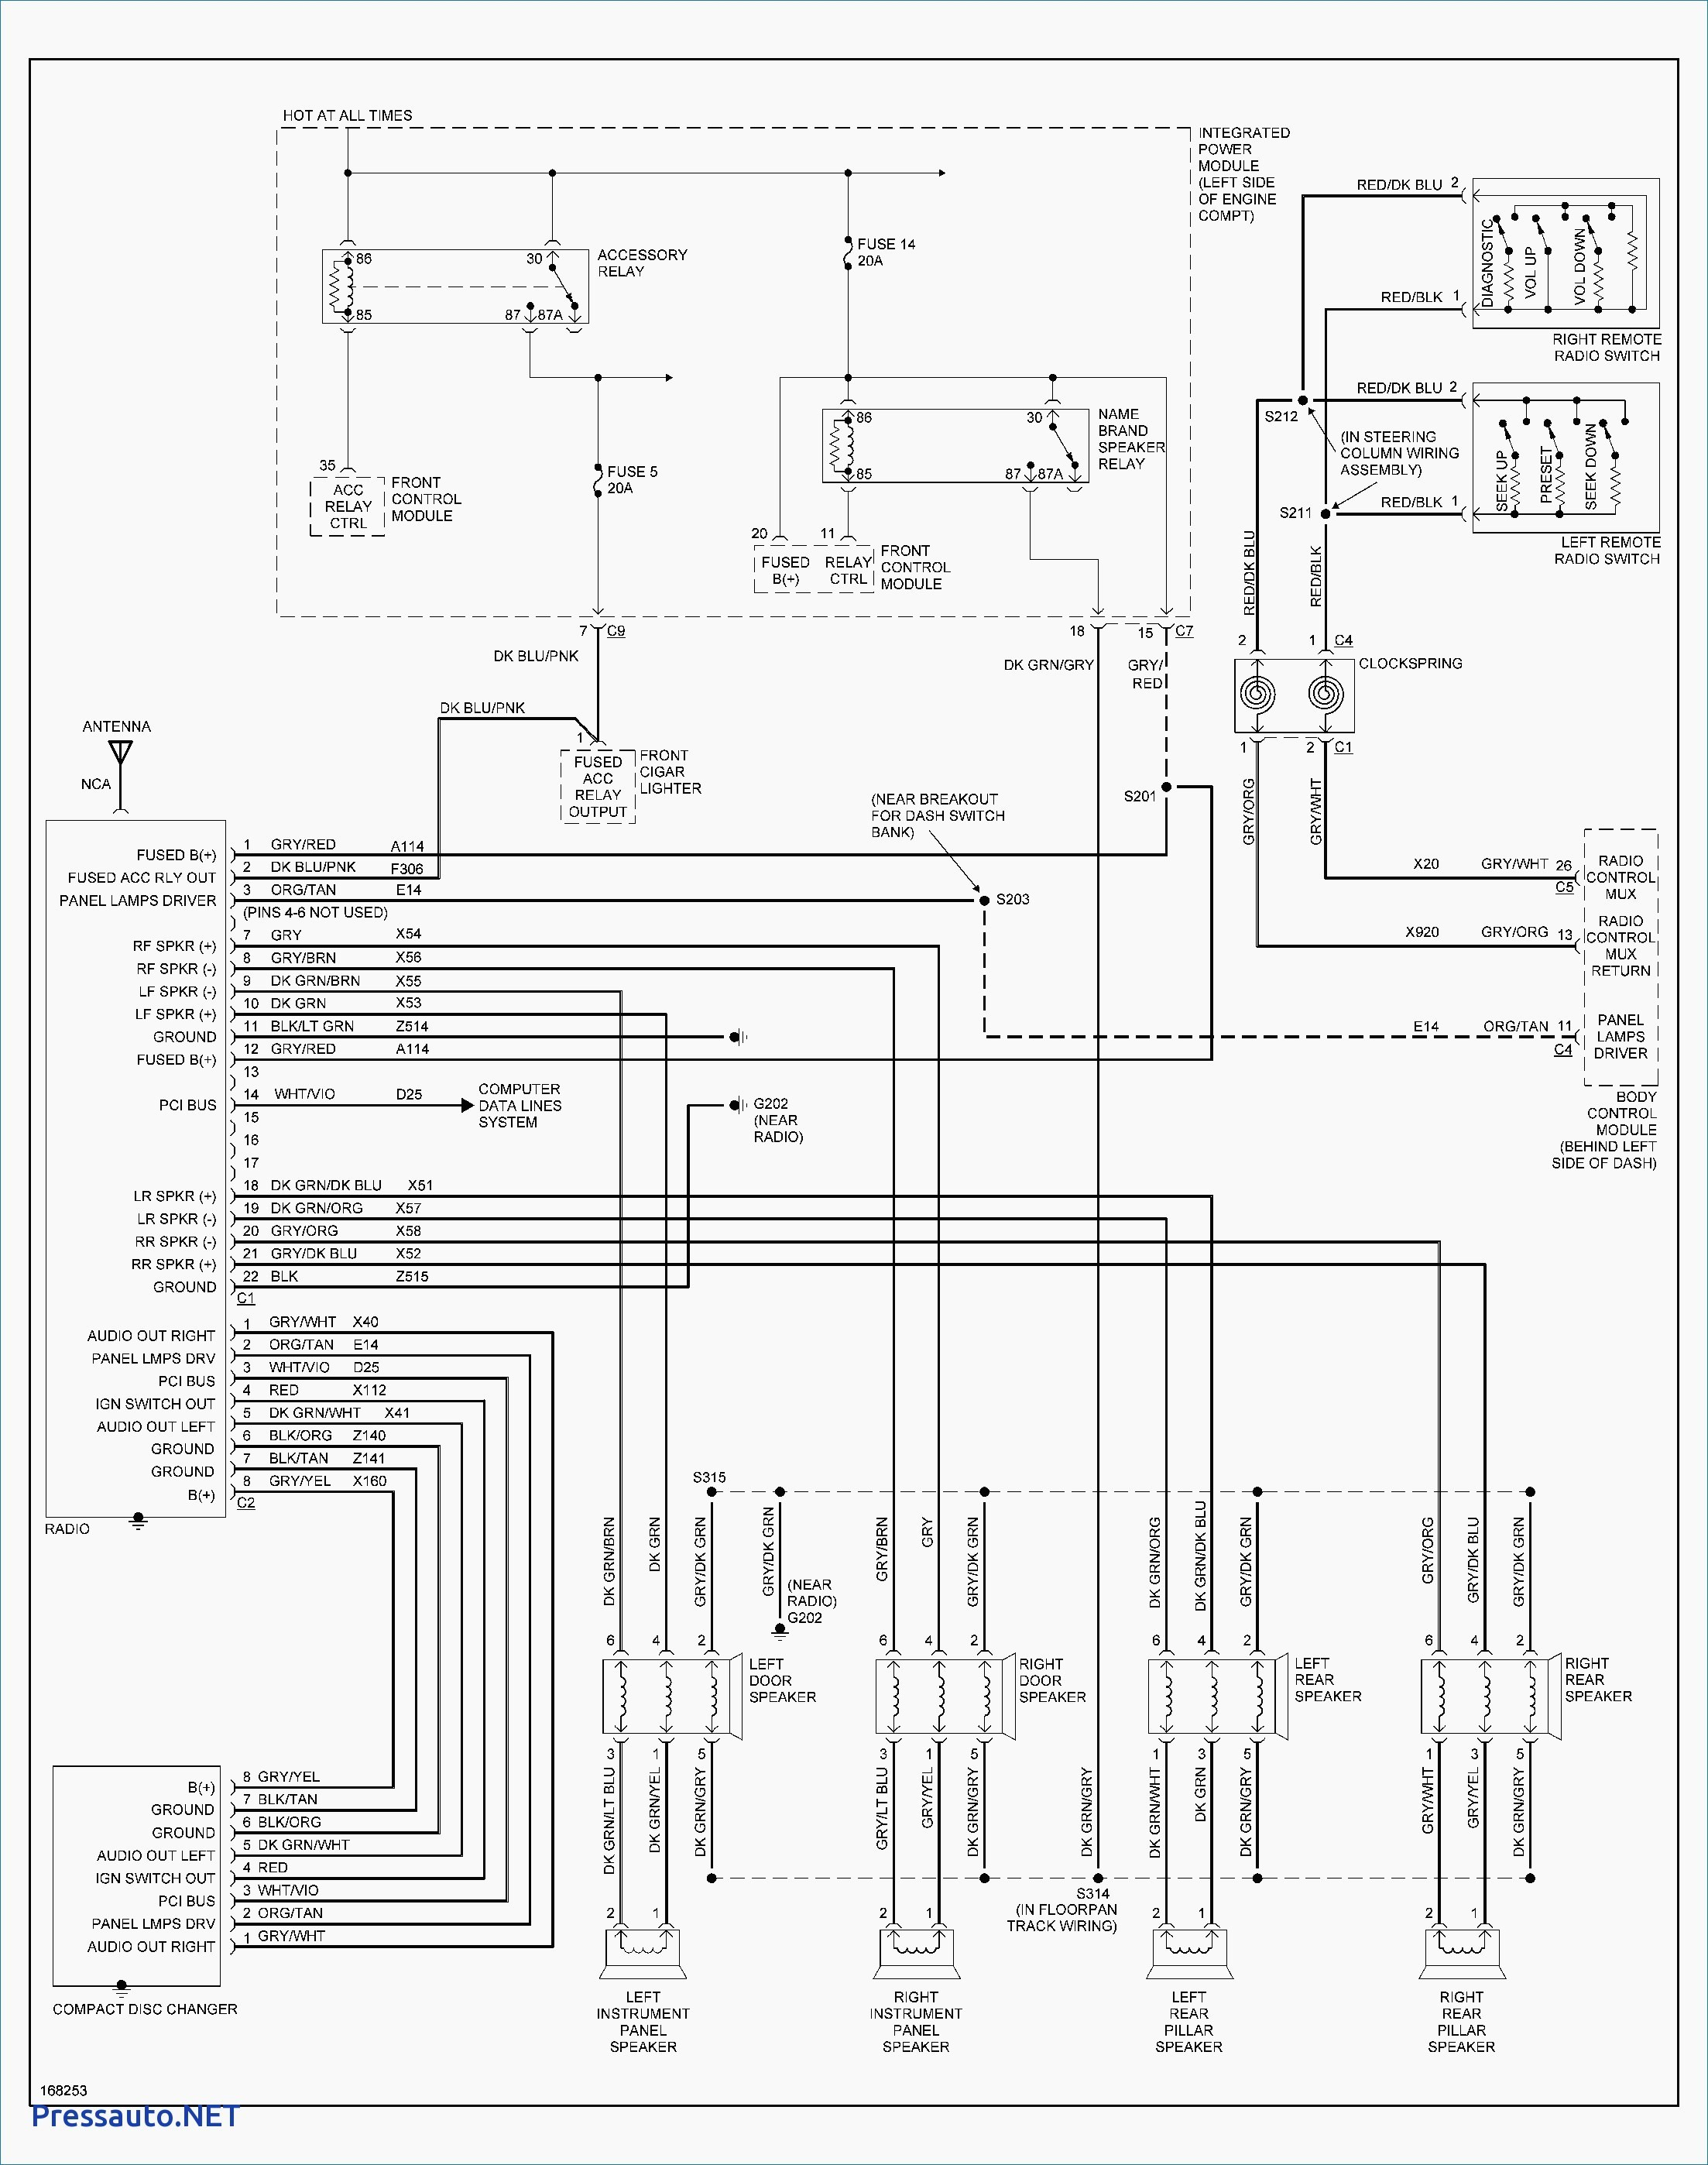 Best solutions 2001 Dodge Ram Radio Wiring Diagram Canopi 2001 Dodge Ram 2500 Stereo Wiring Diagram